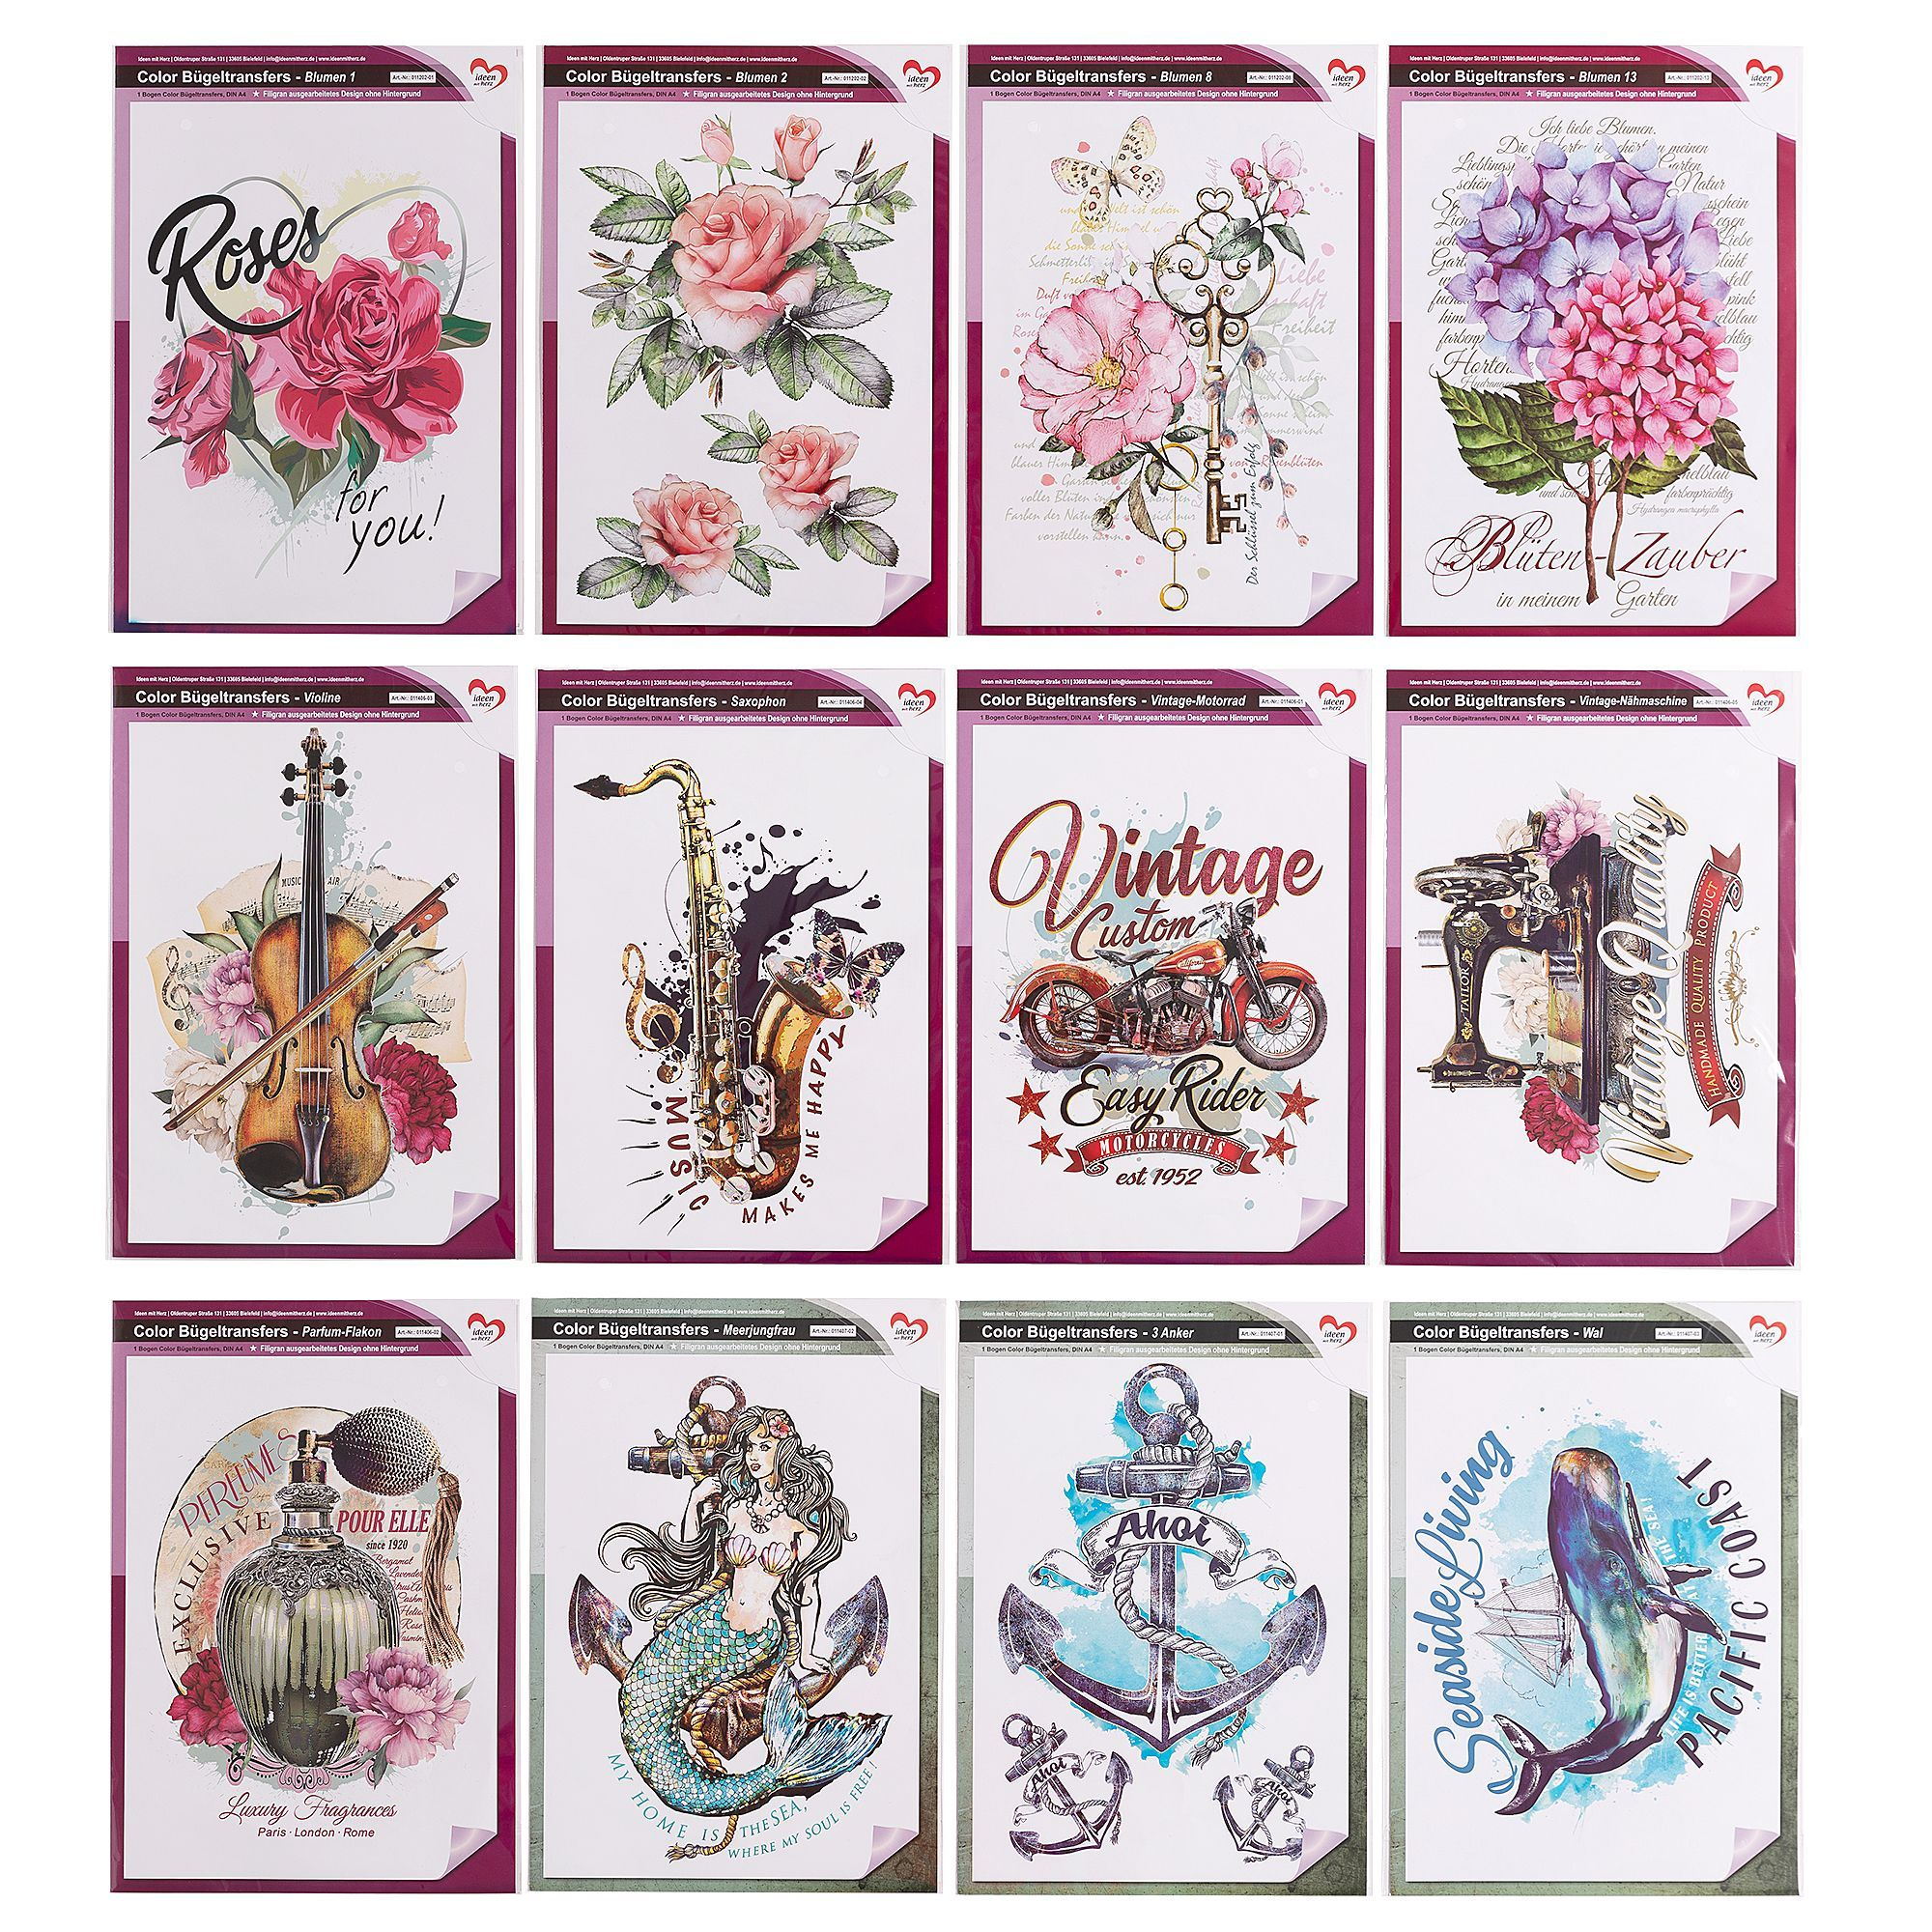 Karin Jittenmeier Textildesign Color Bugeltransfers Verschiedene Motive 12tlg Online Bestellen Bei Qvc De Textildesign Textil Karin Jittenmeier